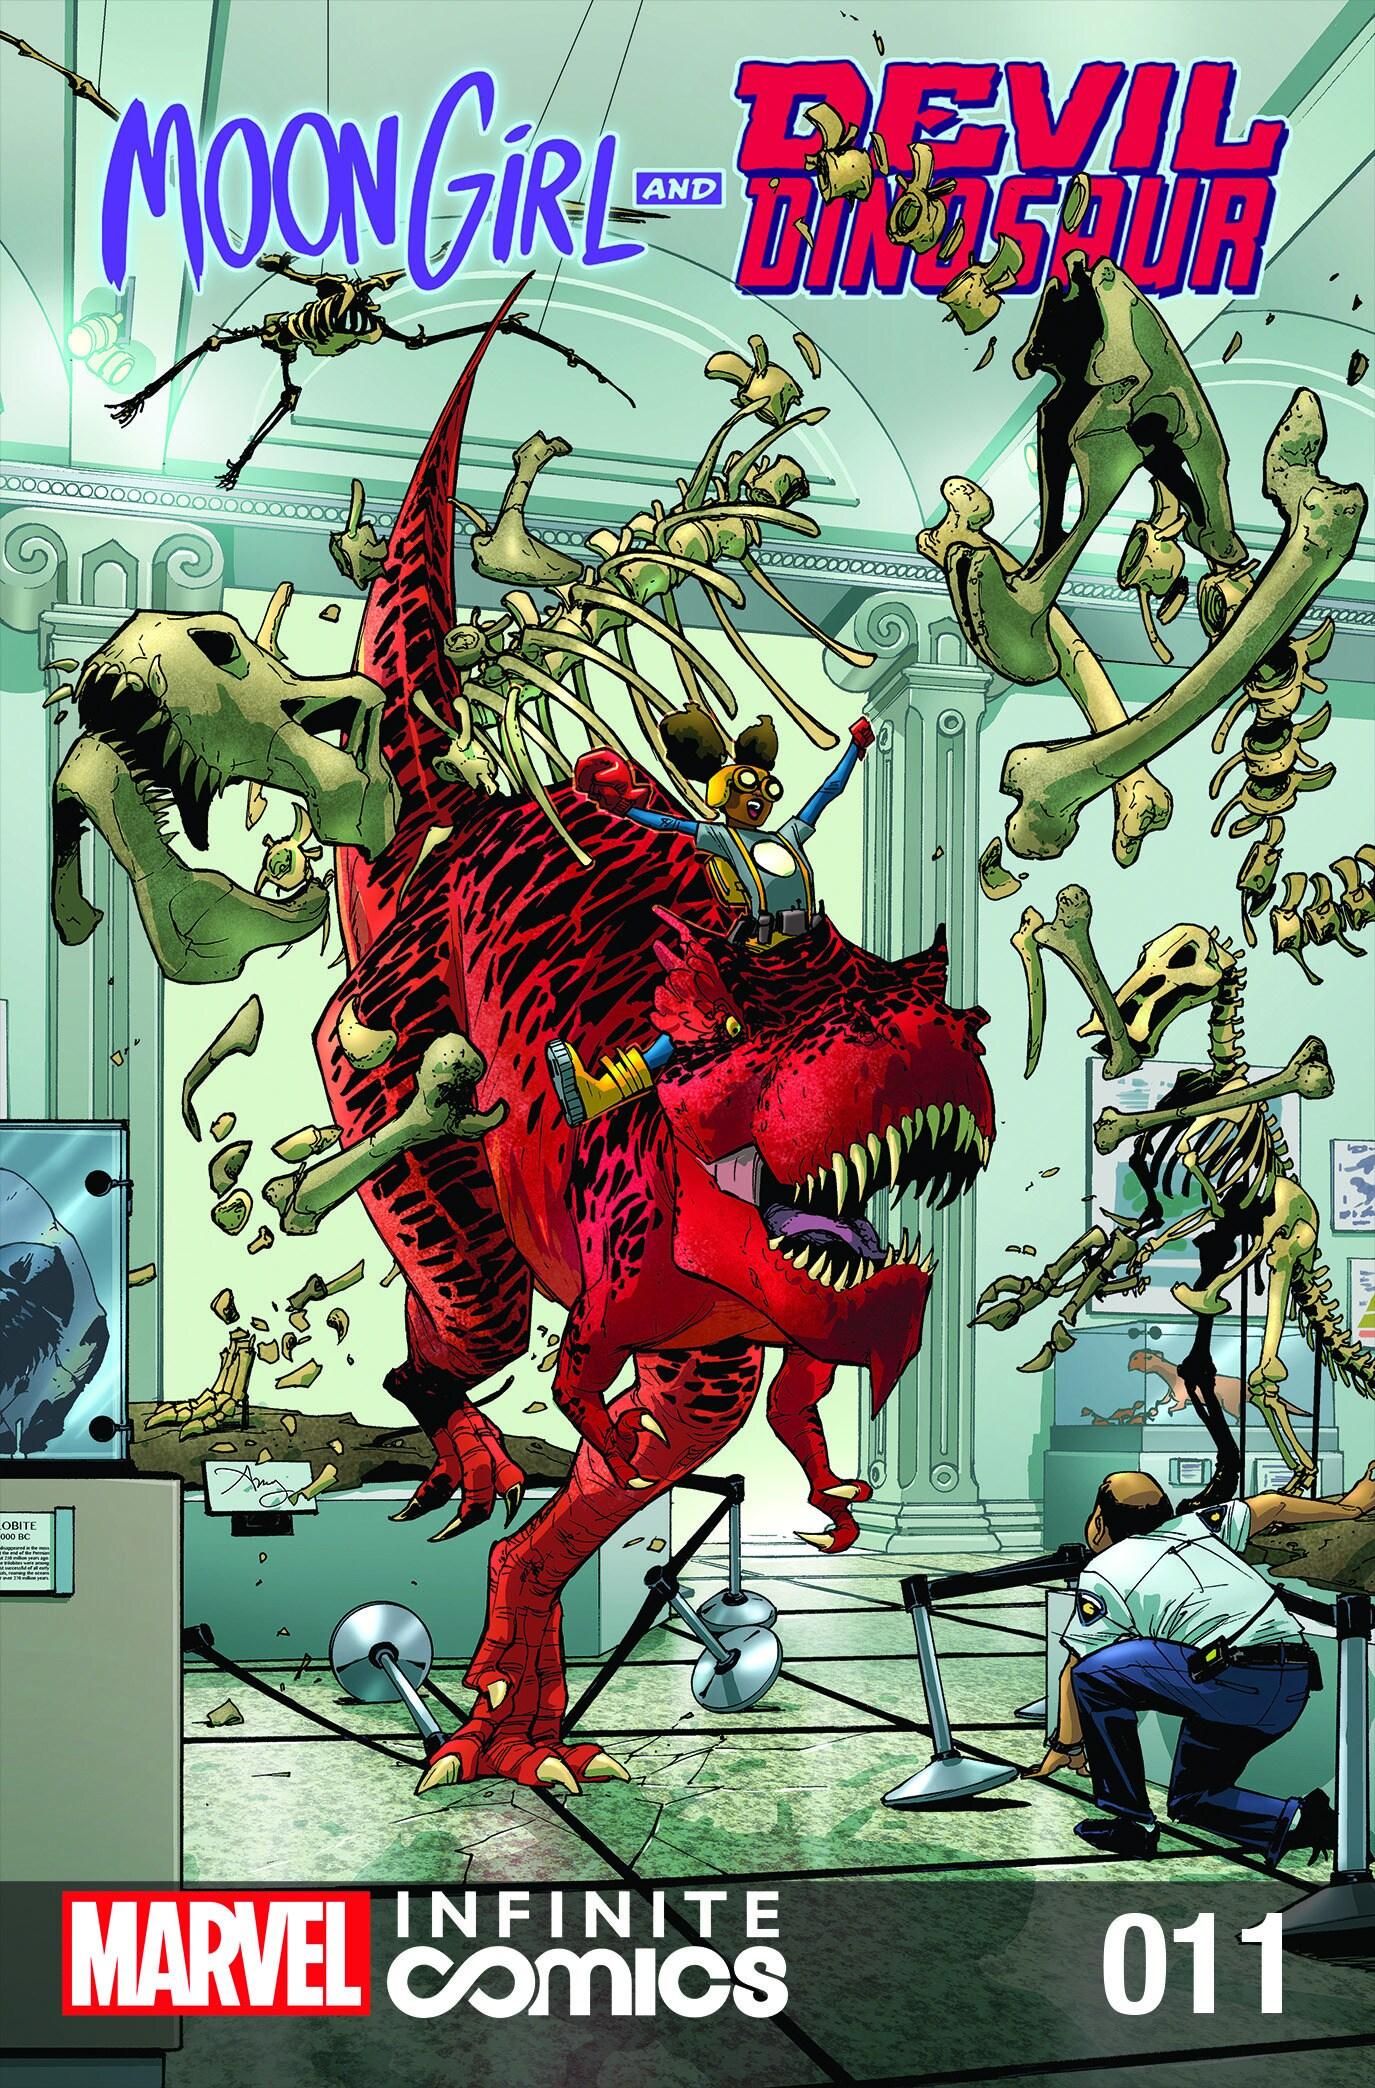 Moon Girl and Devil Dinosaur #11